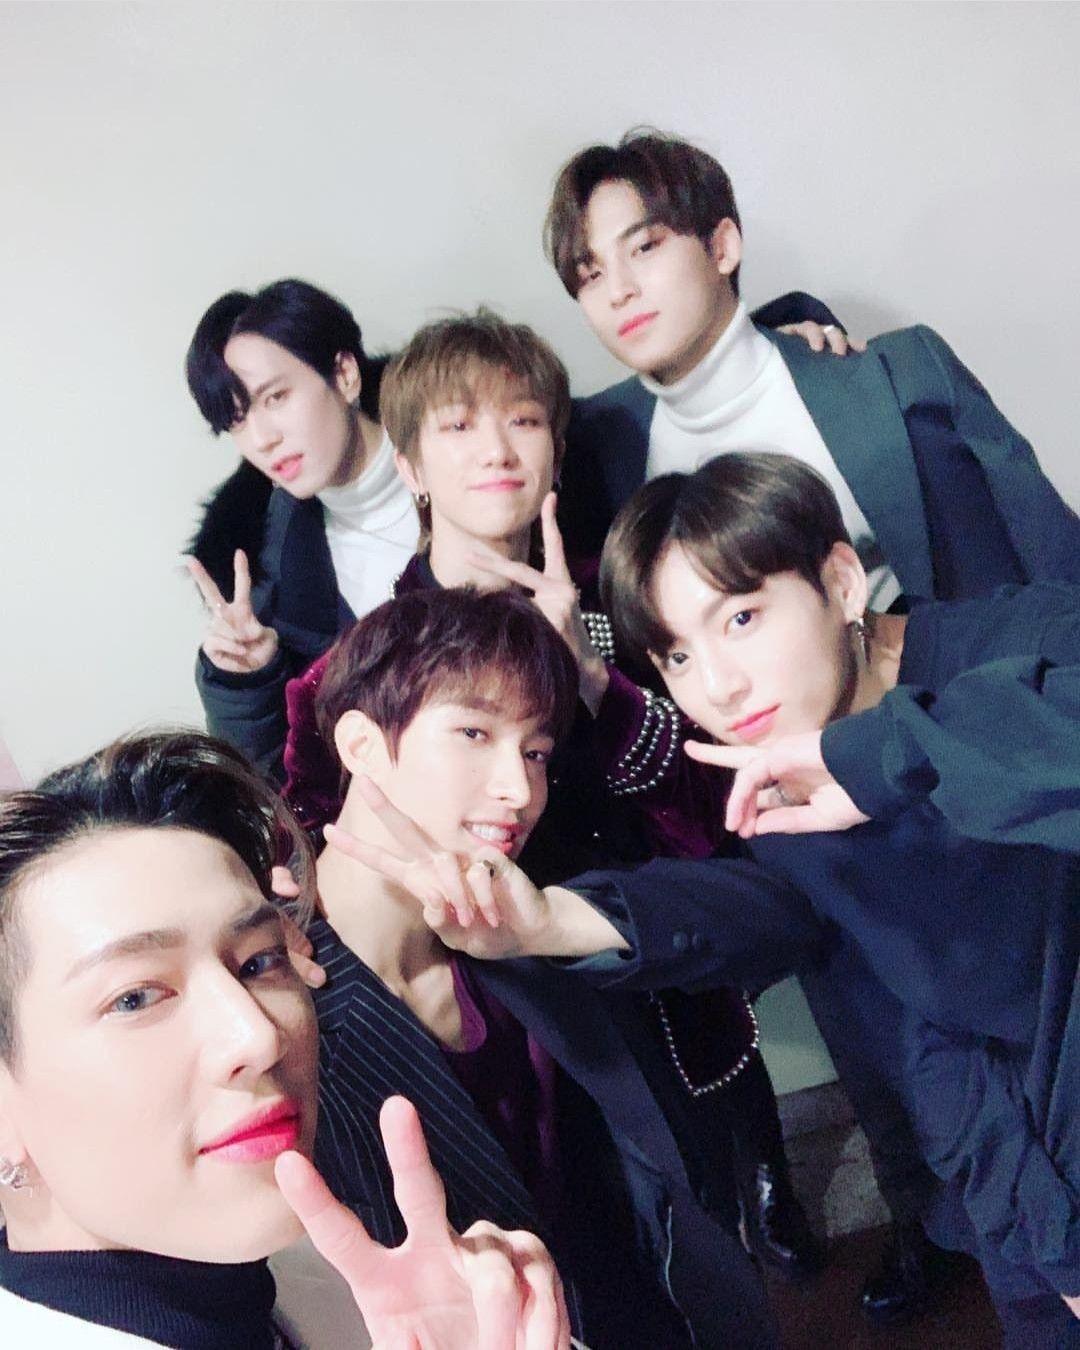 1997 Liners Jungkook Yugyeom Bambam Dk The8 Mingyu Jungkook Got7 Kpop